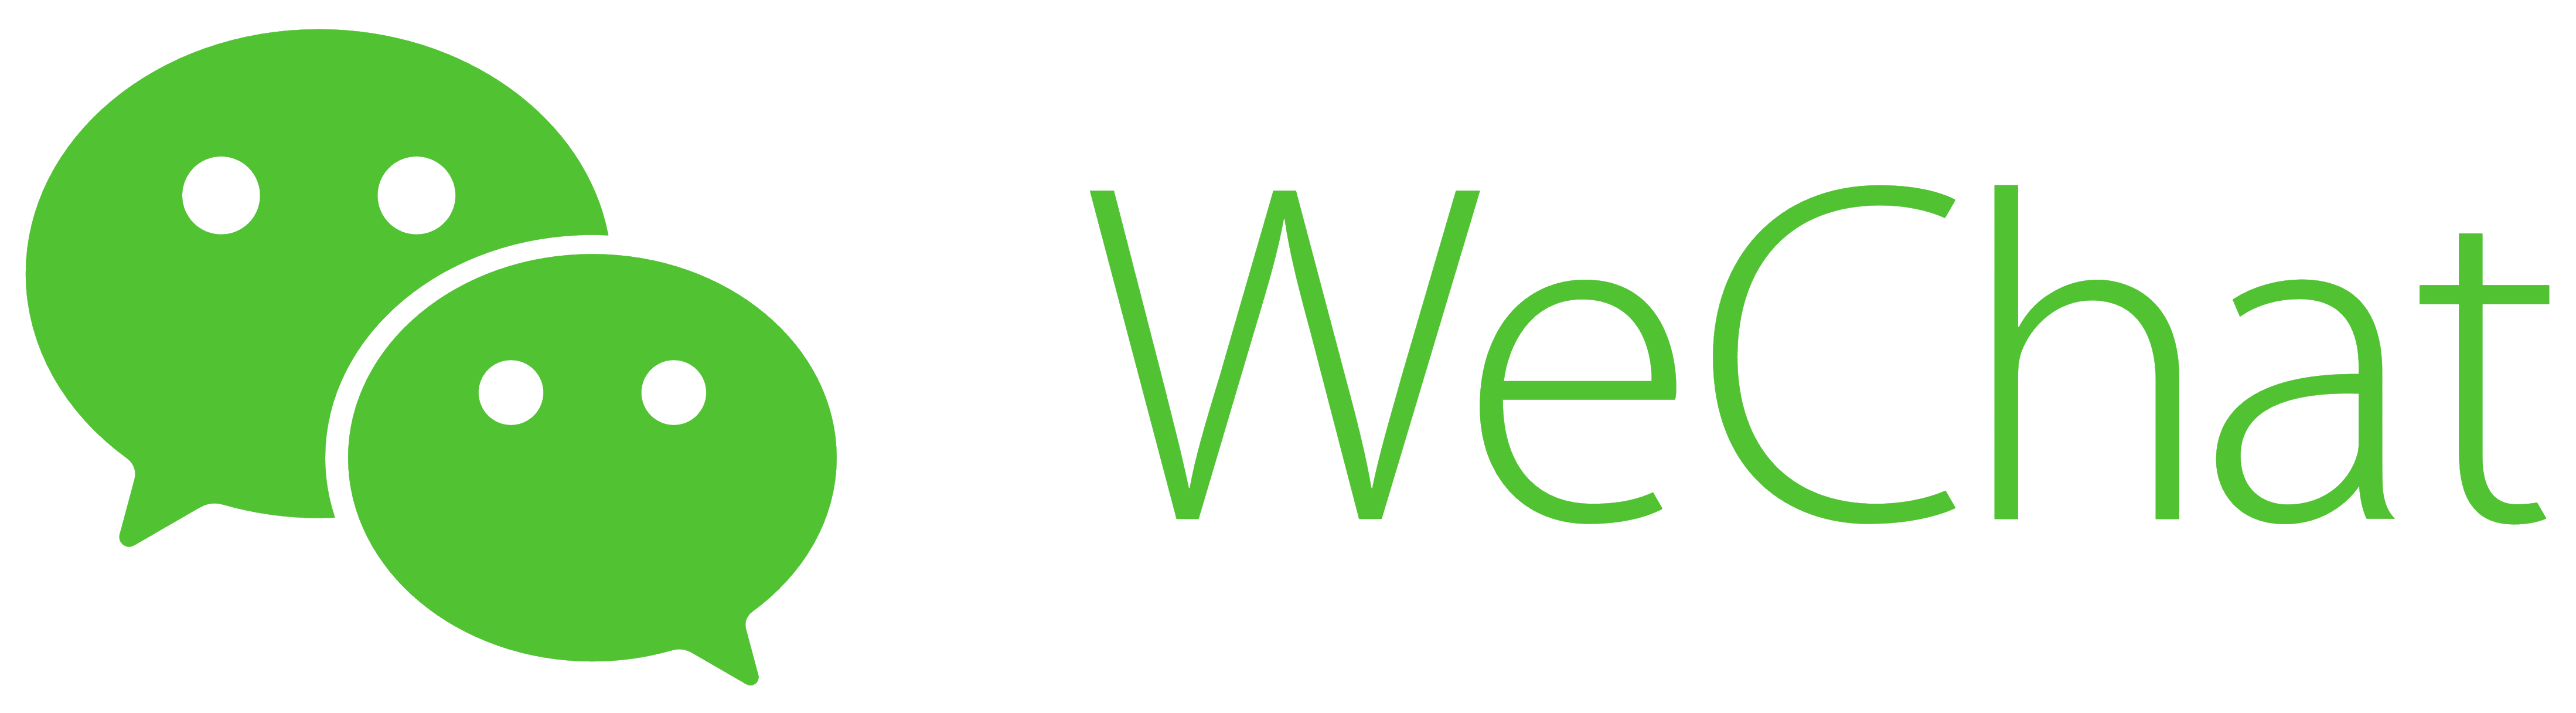 wechat � logos download